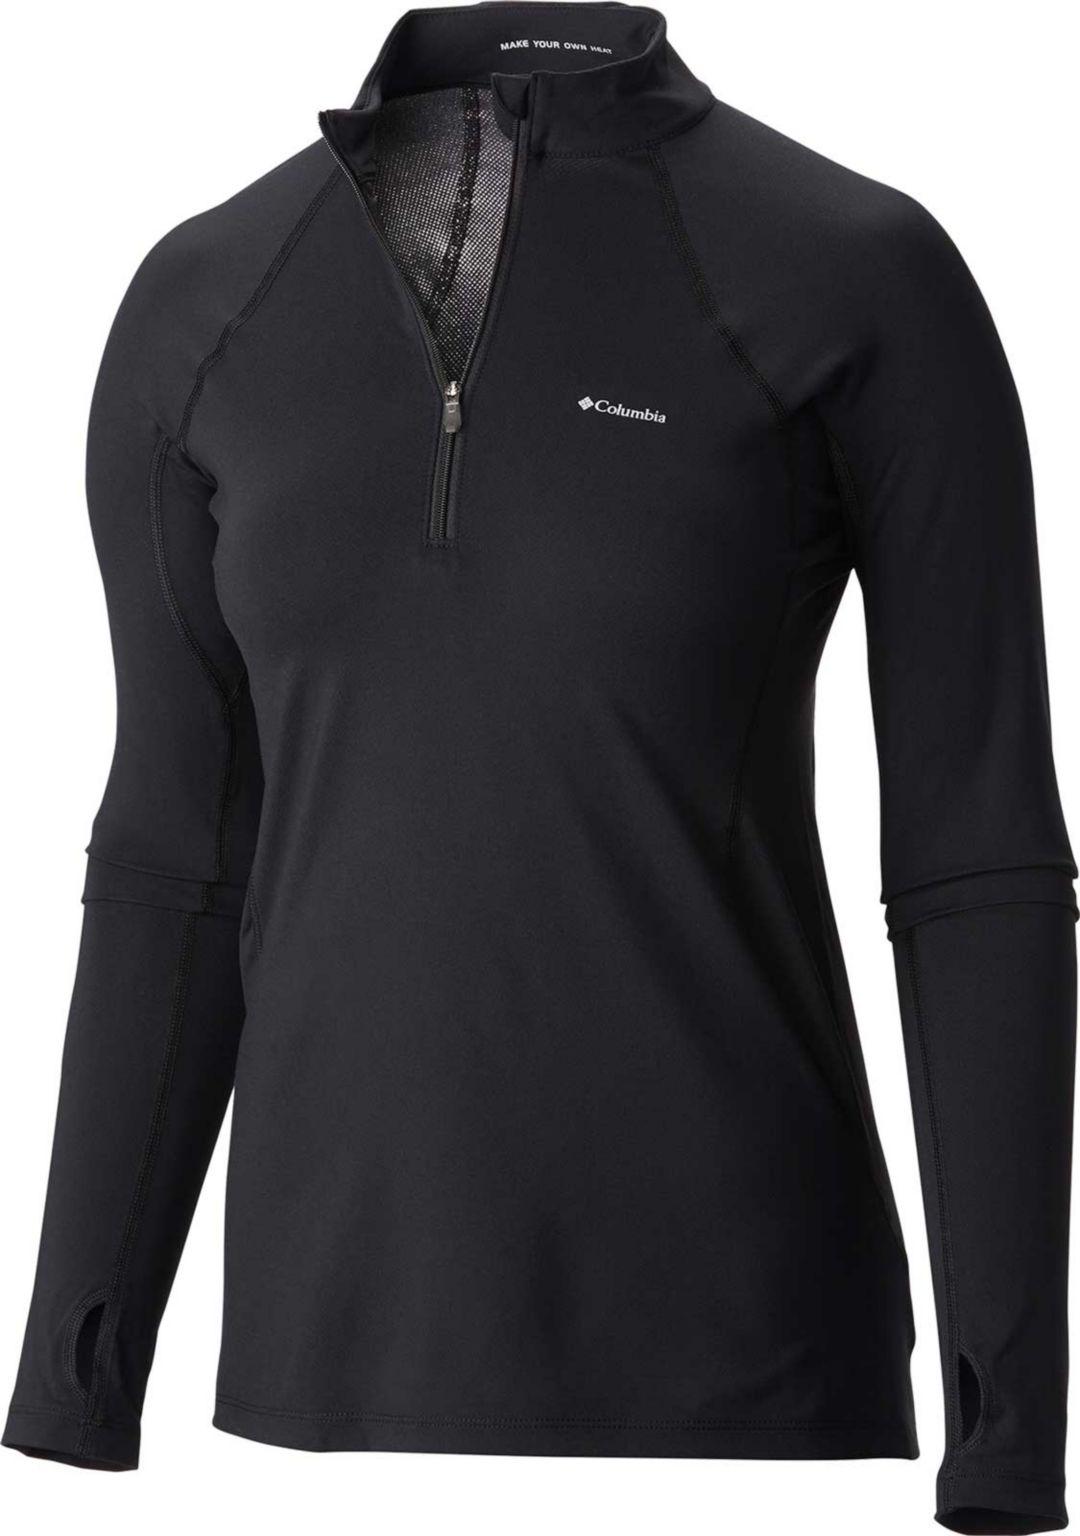 770c50b71 Columbia Women's Midweight Stretch Long Sleeve Half Zip Shirt